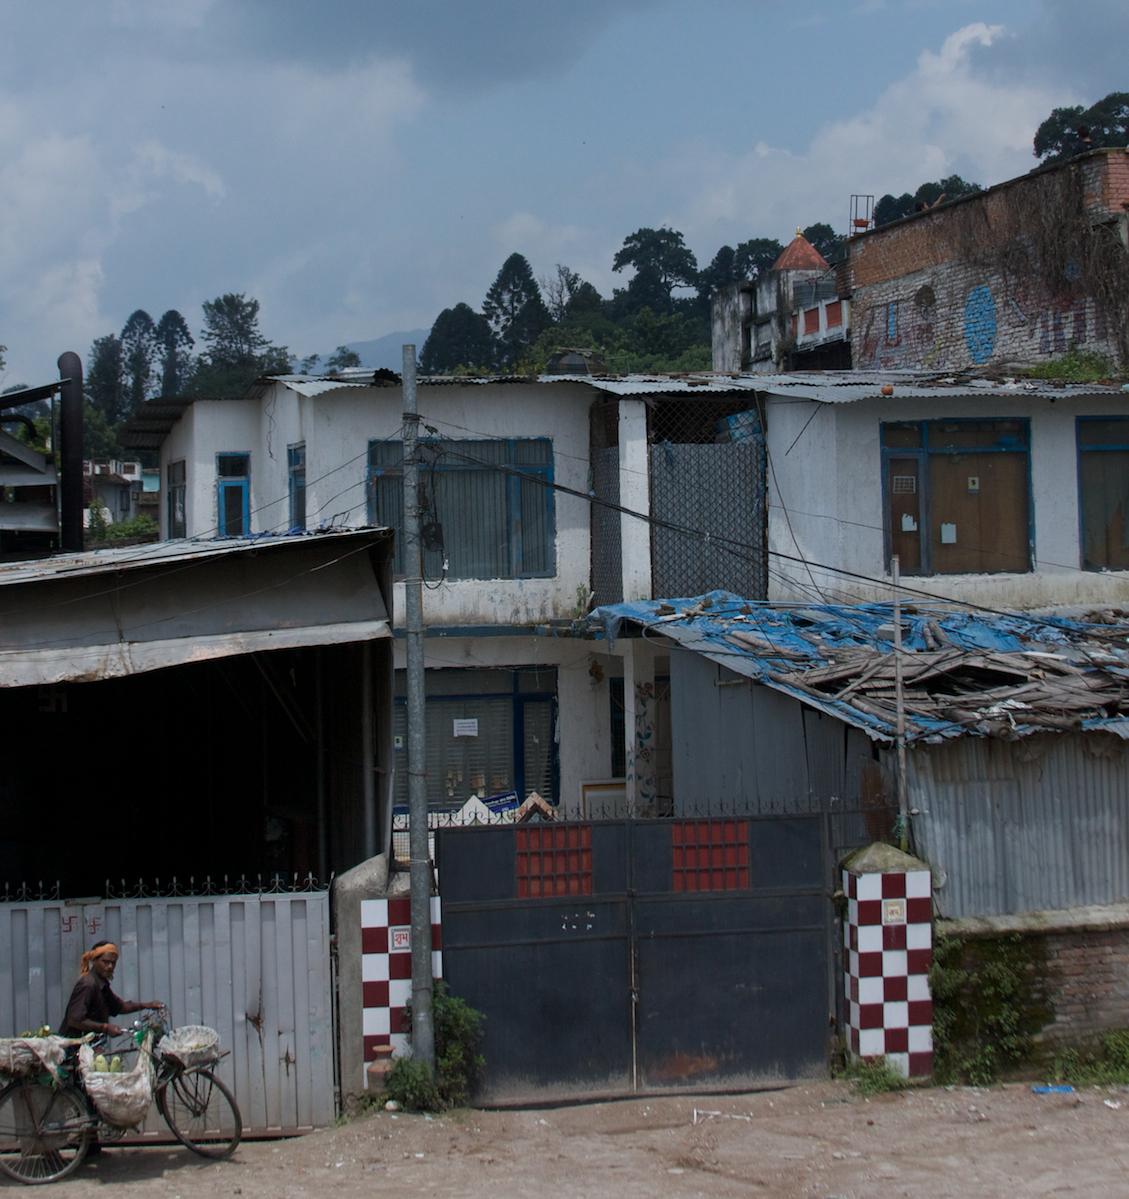 Speculations, Photo 5, Kathmandu, 2008